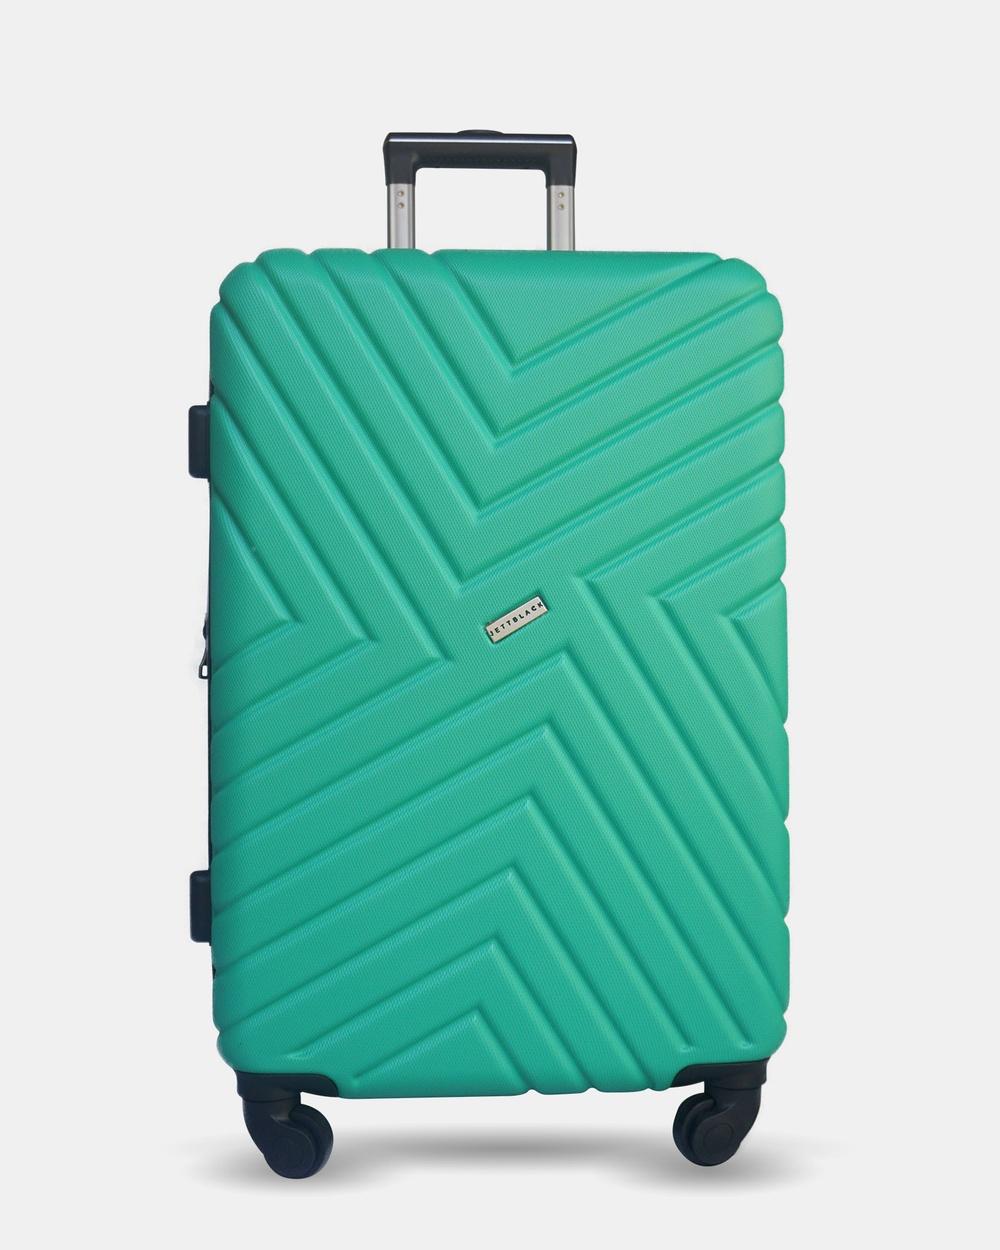 JETT BLACK Emerald Maze Medium Suitcase Bags Green